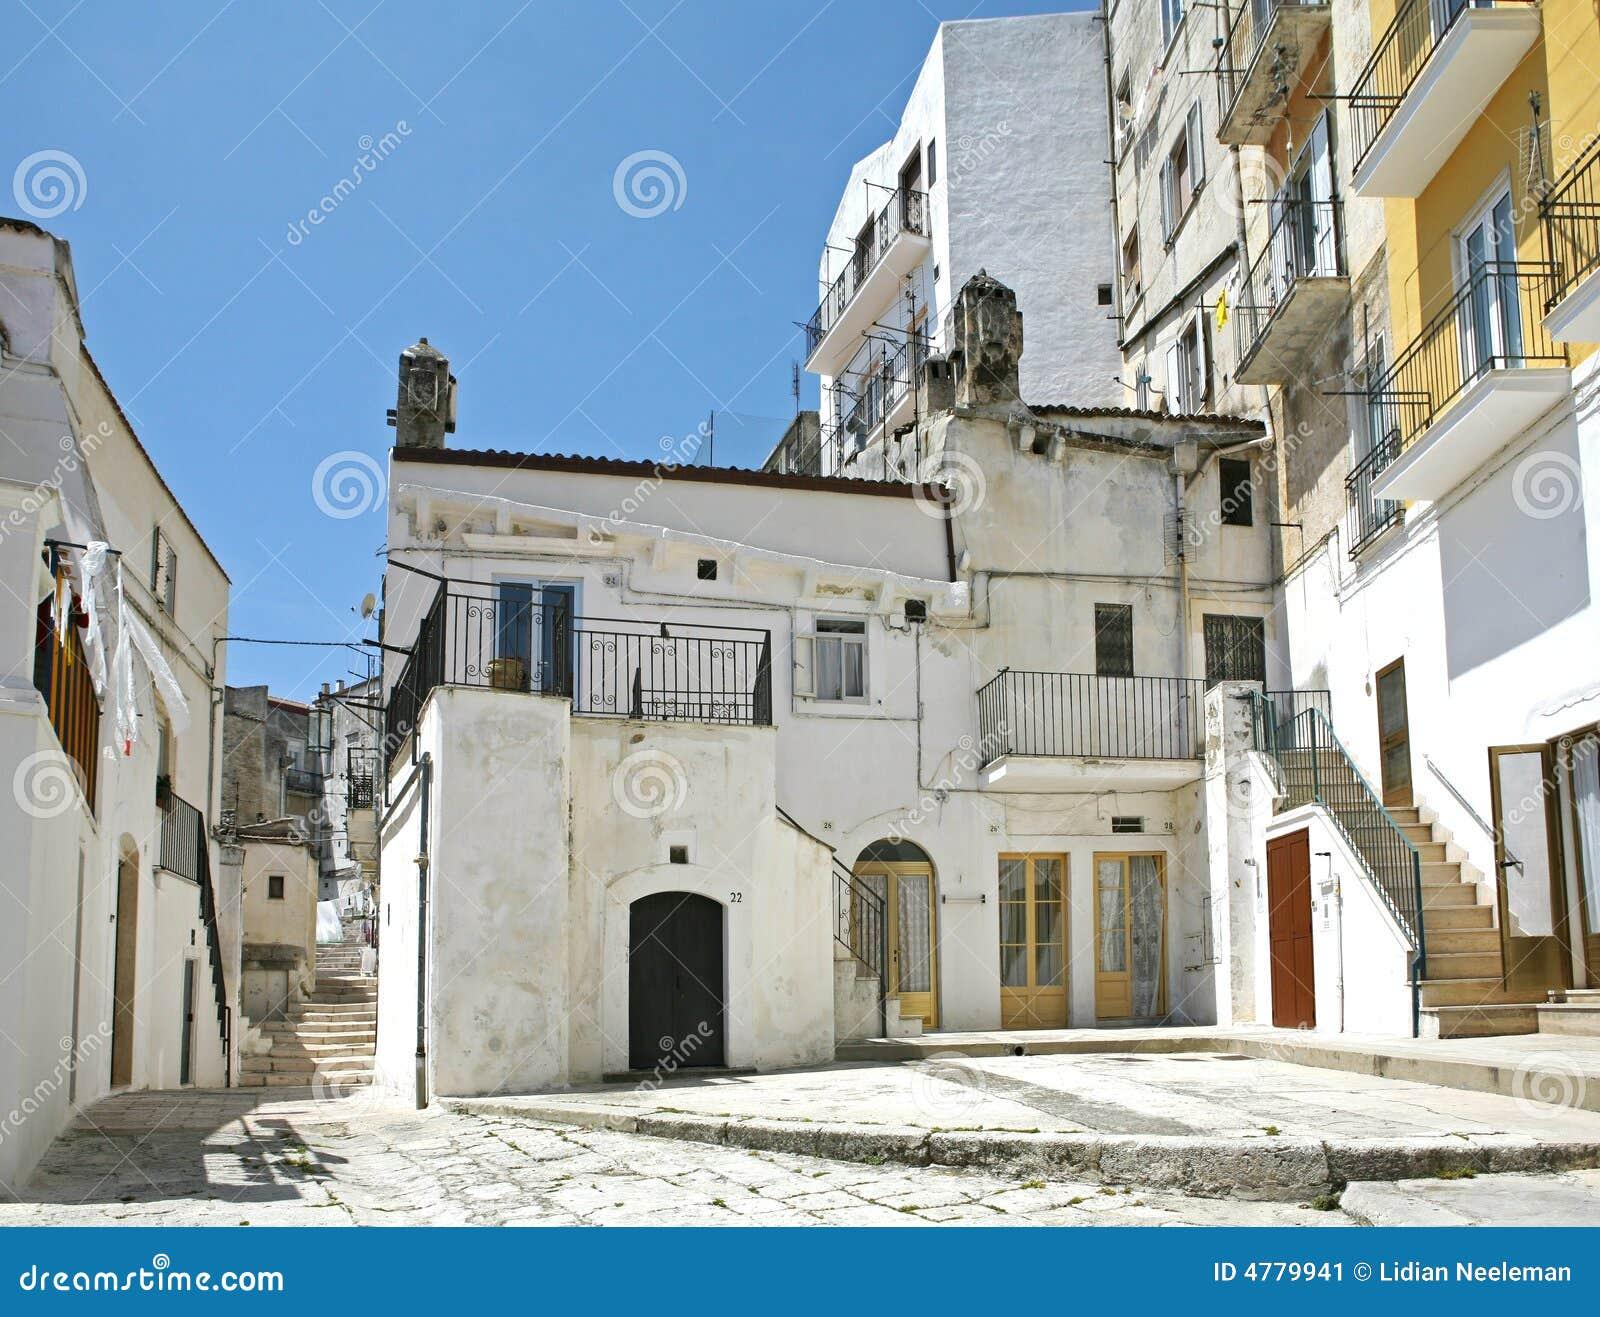 Street Scene In Italy Stock Image. Image Of Village